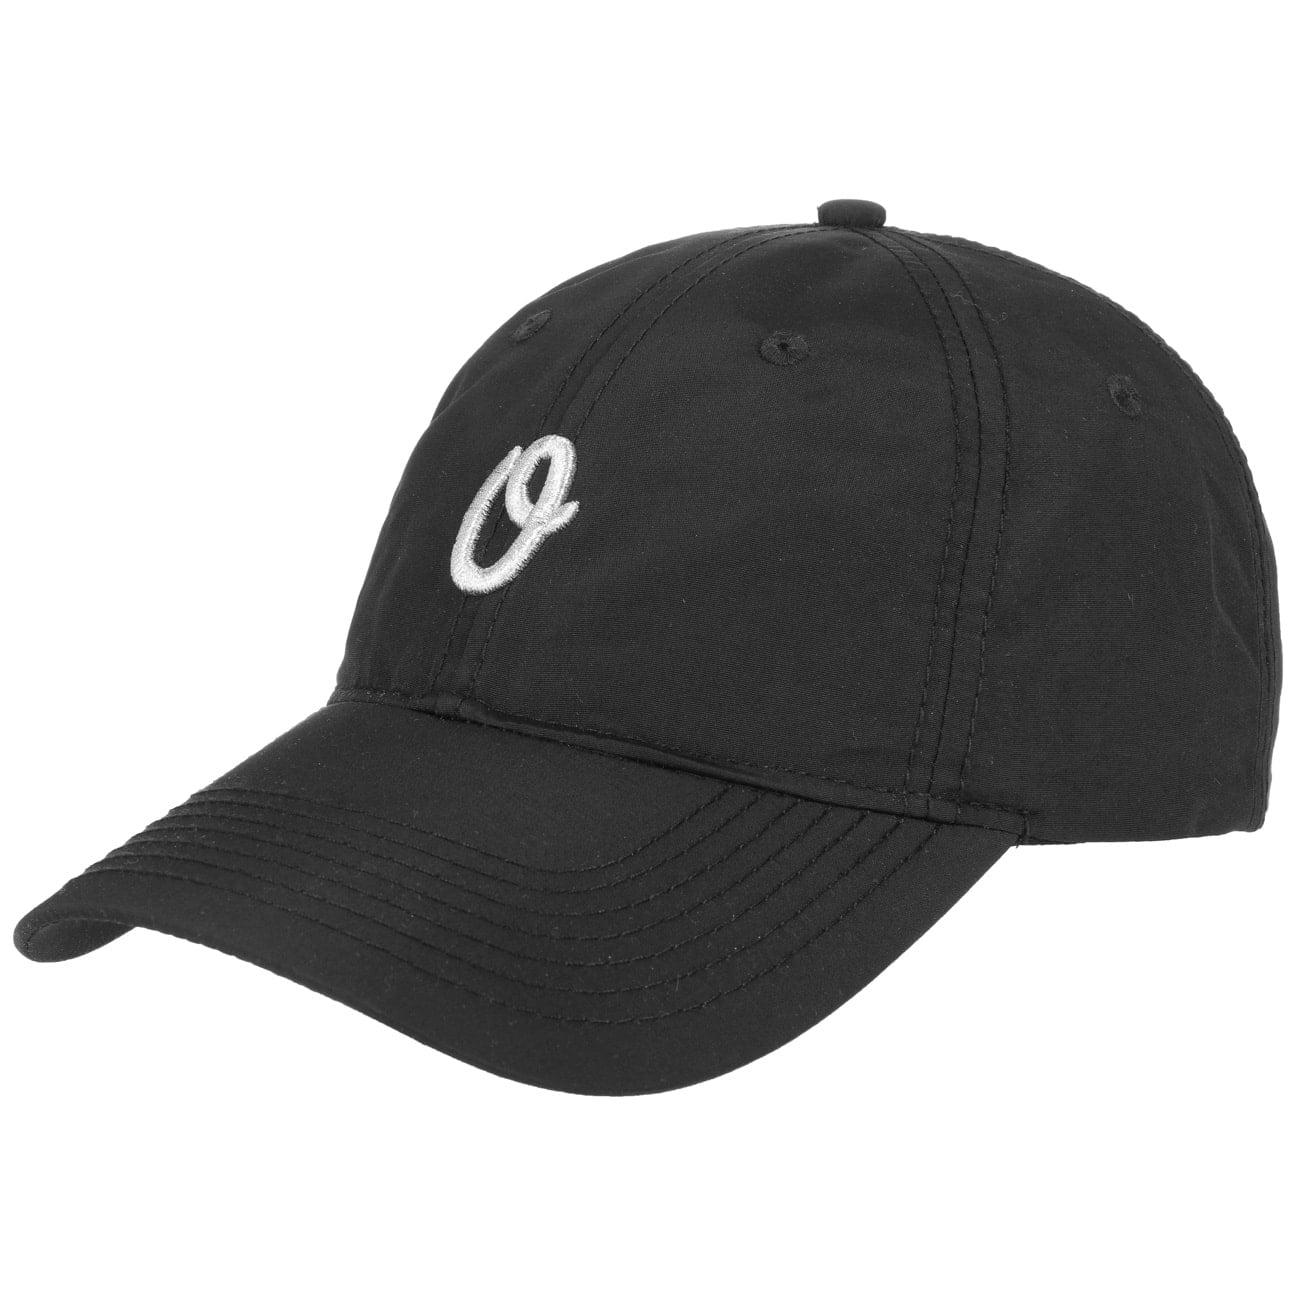 Casquette Miles Olo by Official Headwear  baseball cap